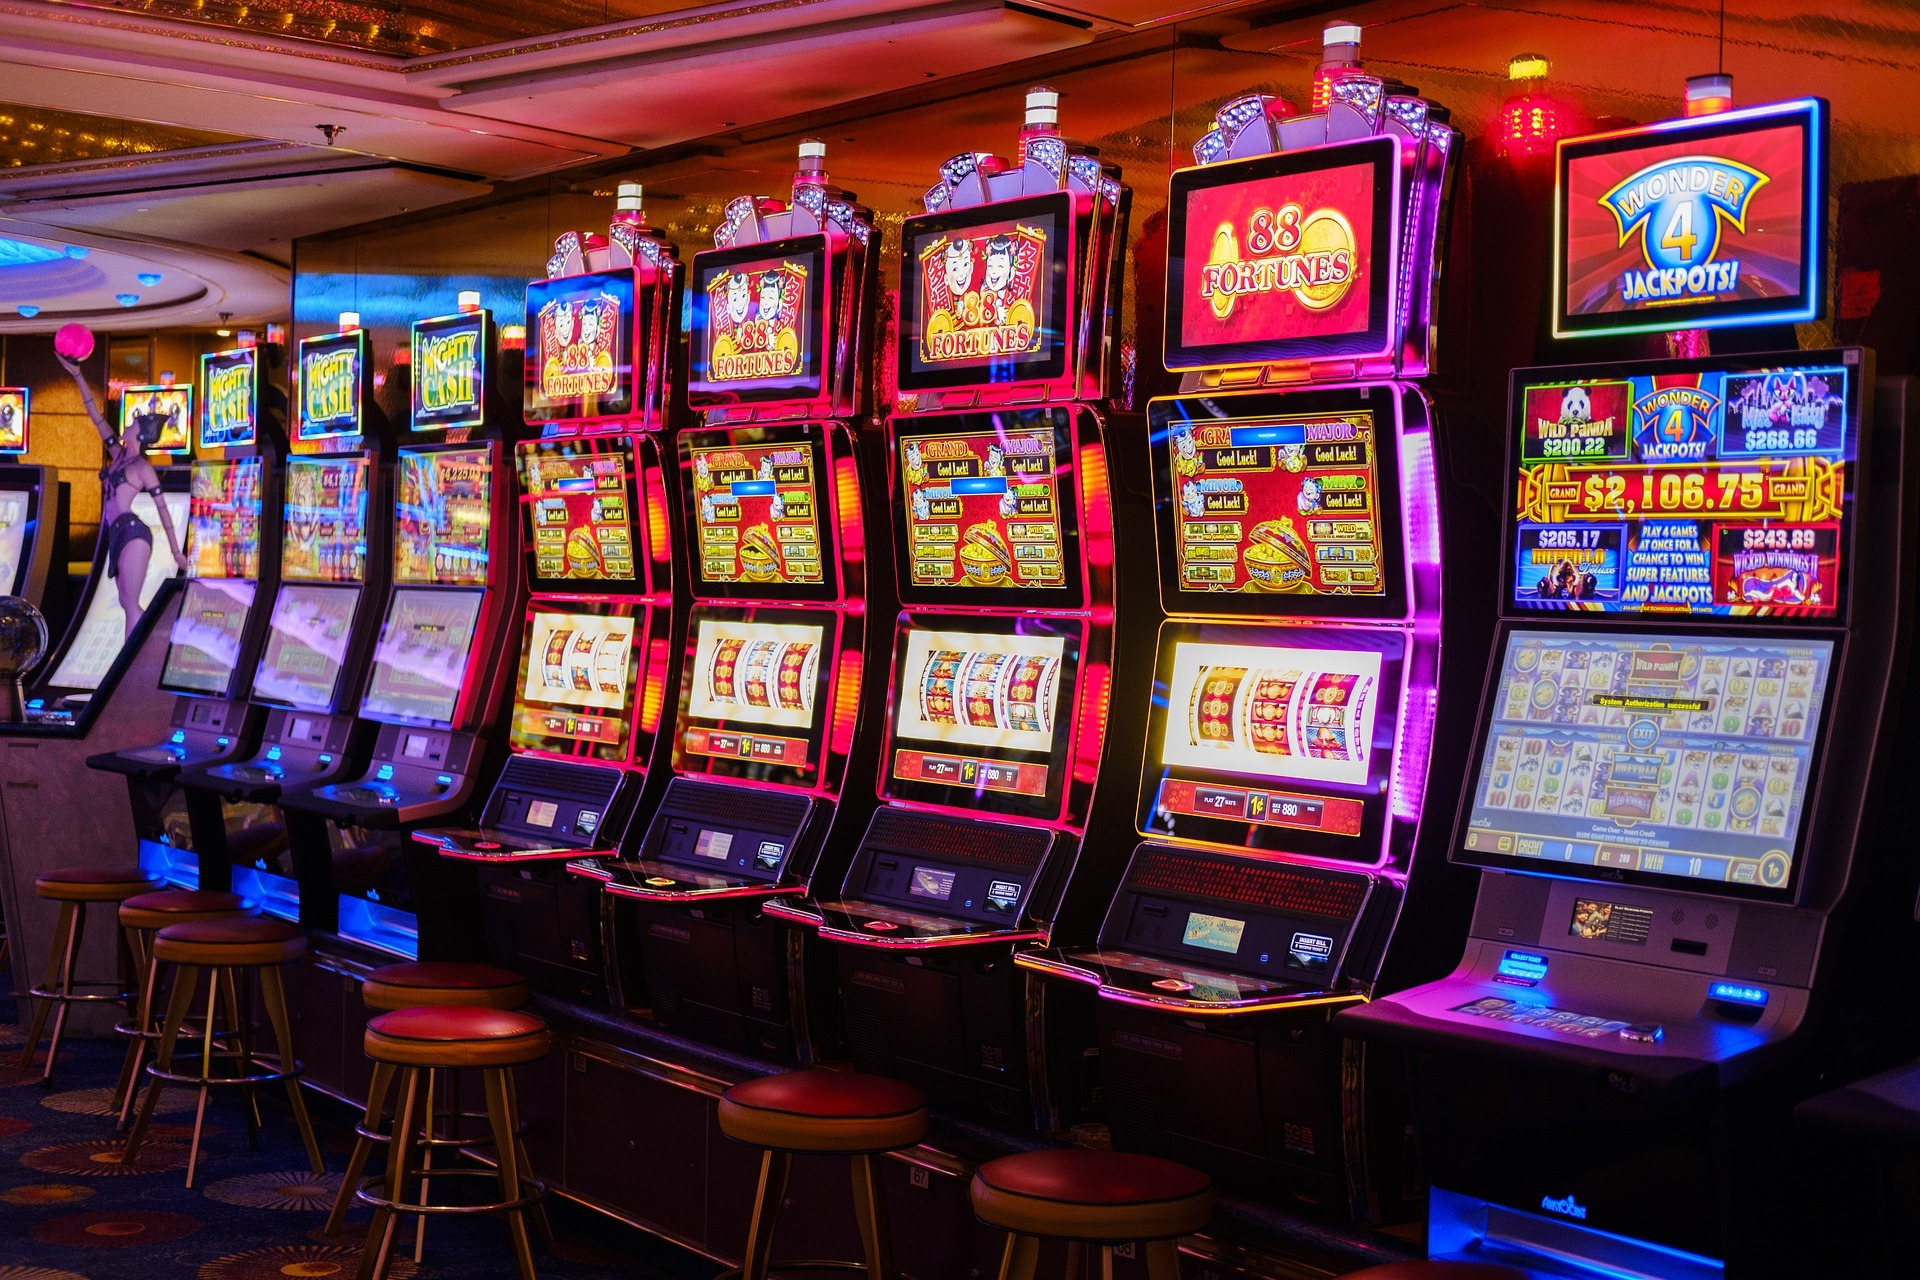 Casino Sponsorship Across Sports in Italy -Juvefc.com